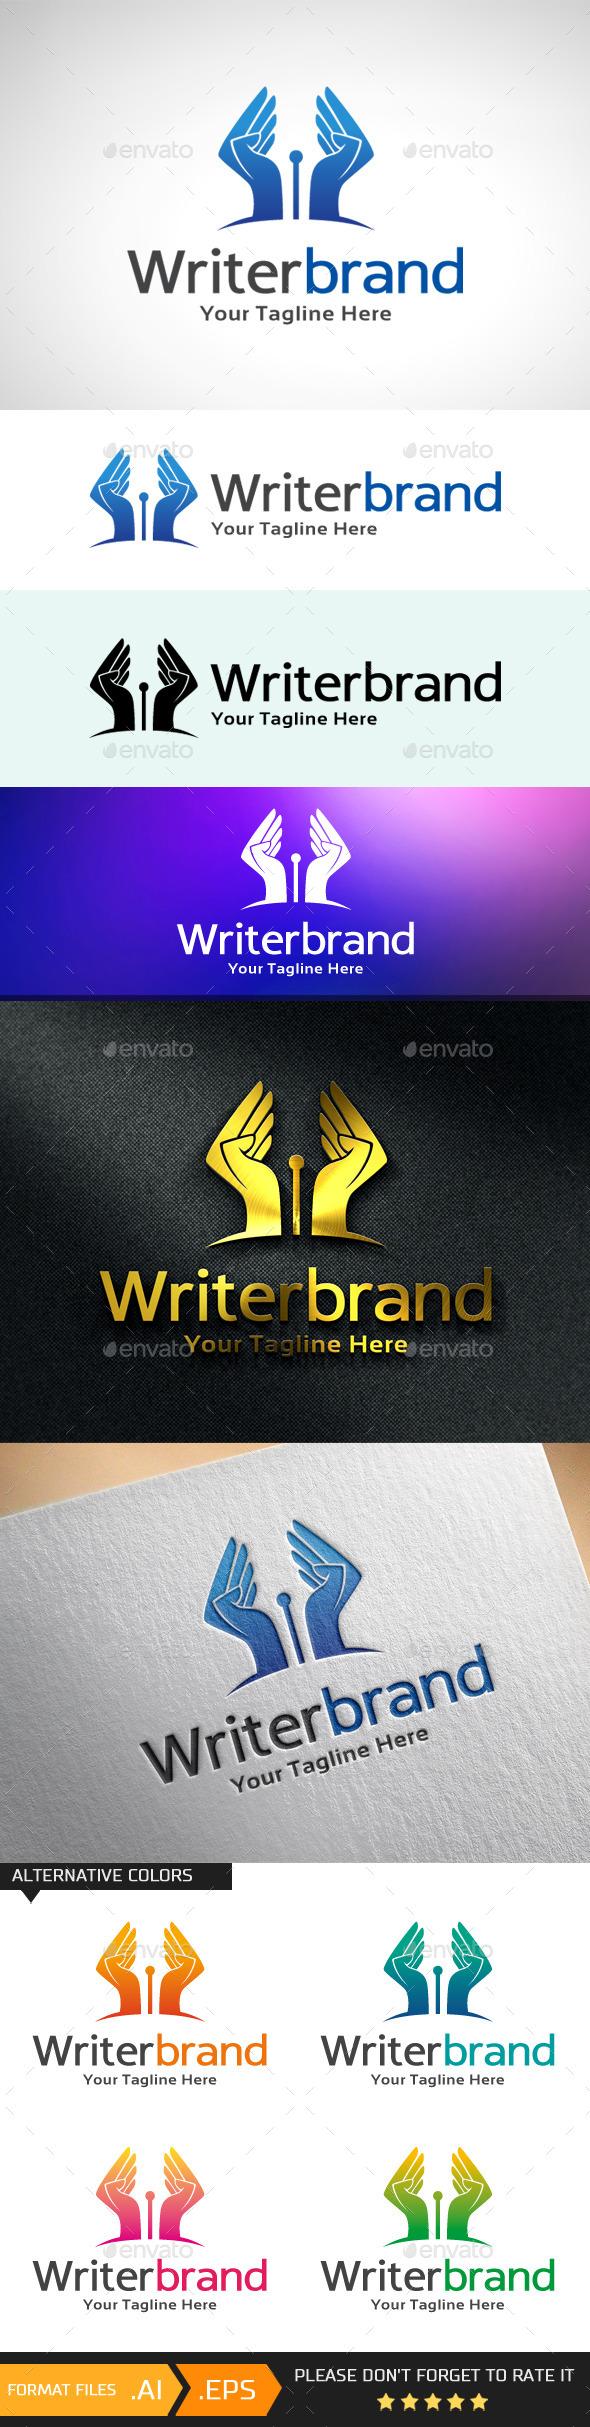 Writer Brand Logo Template - Objects Logo Templates